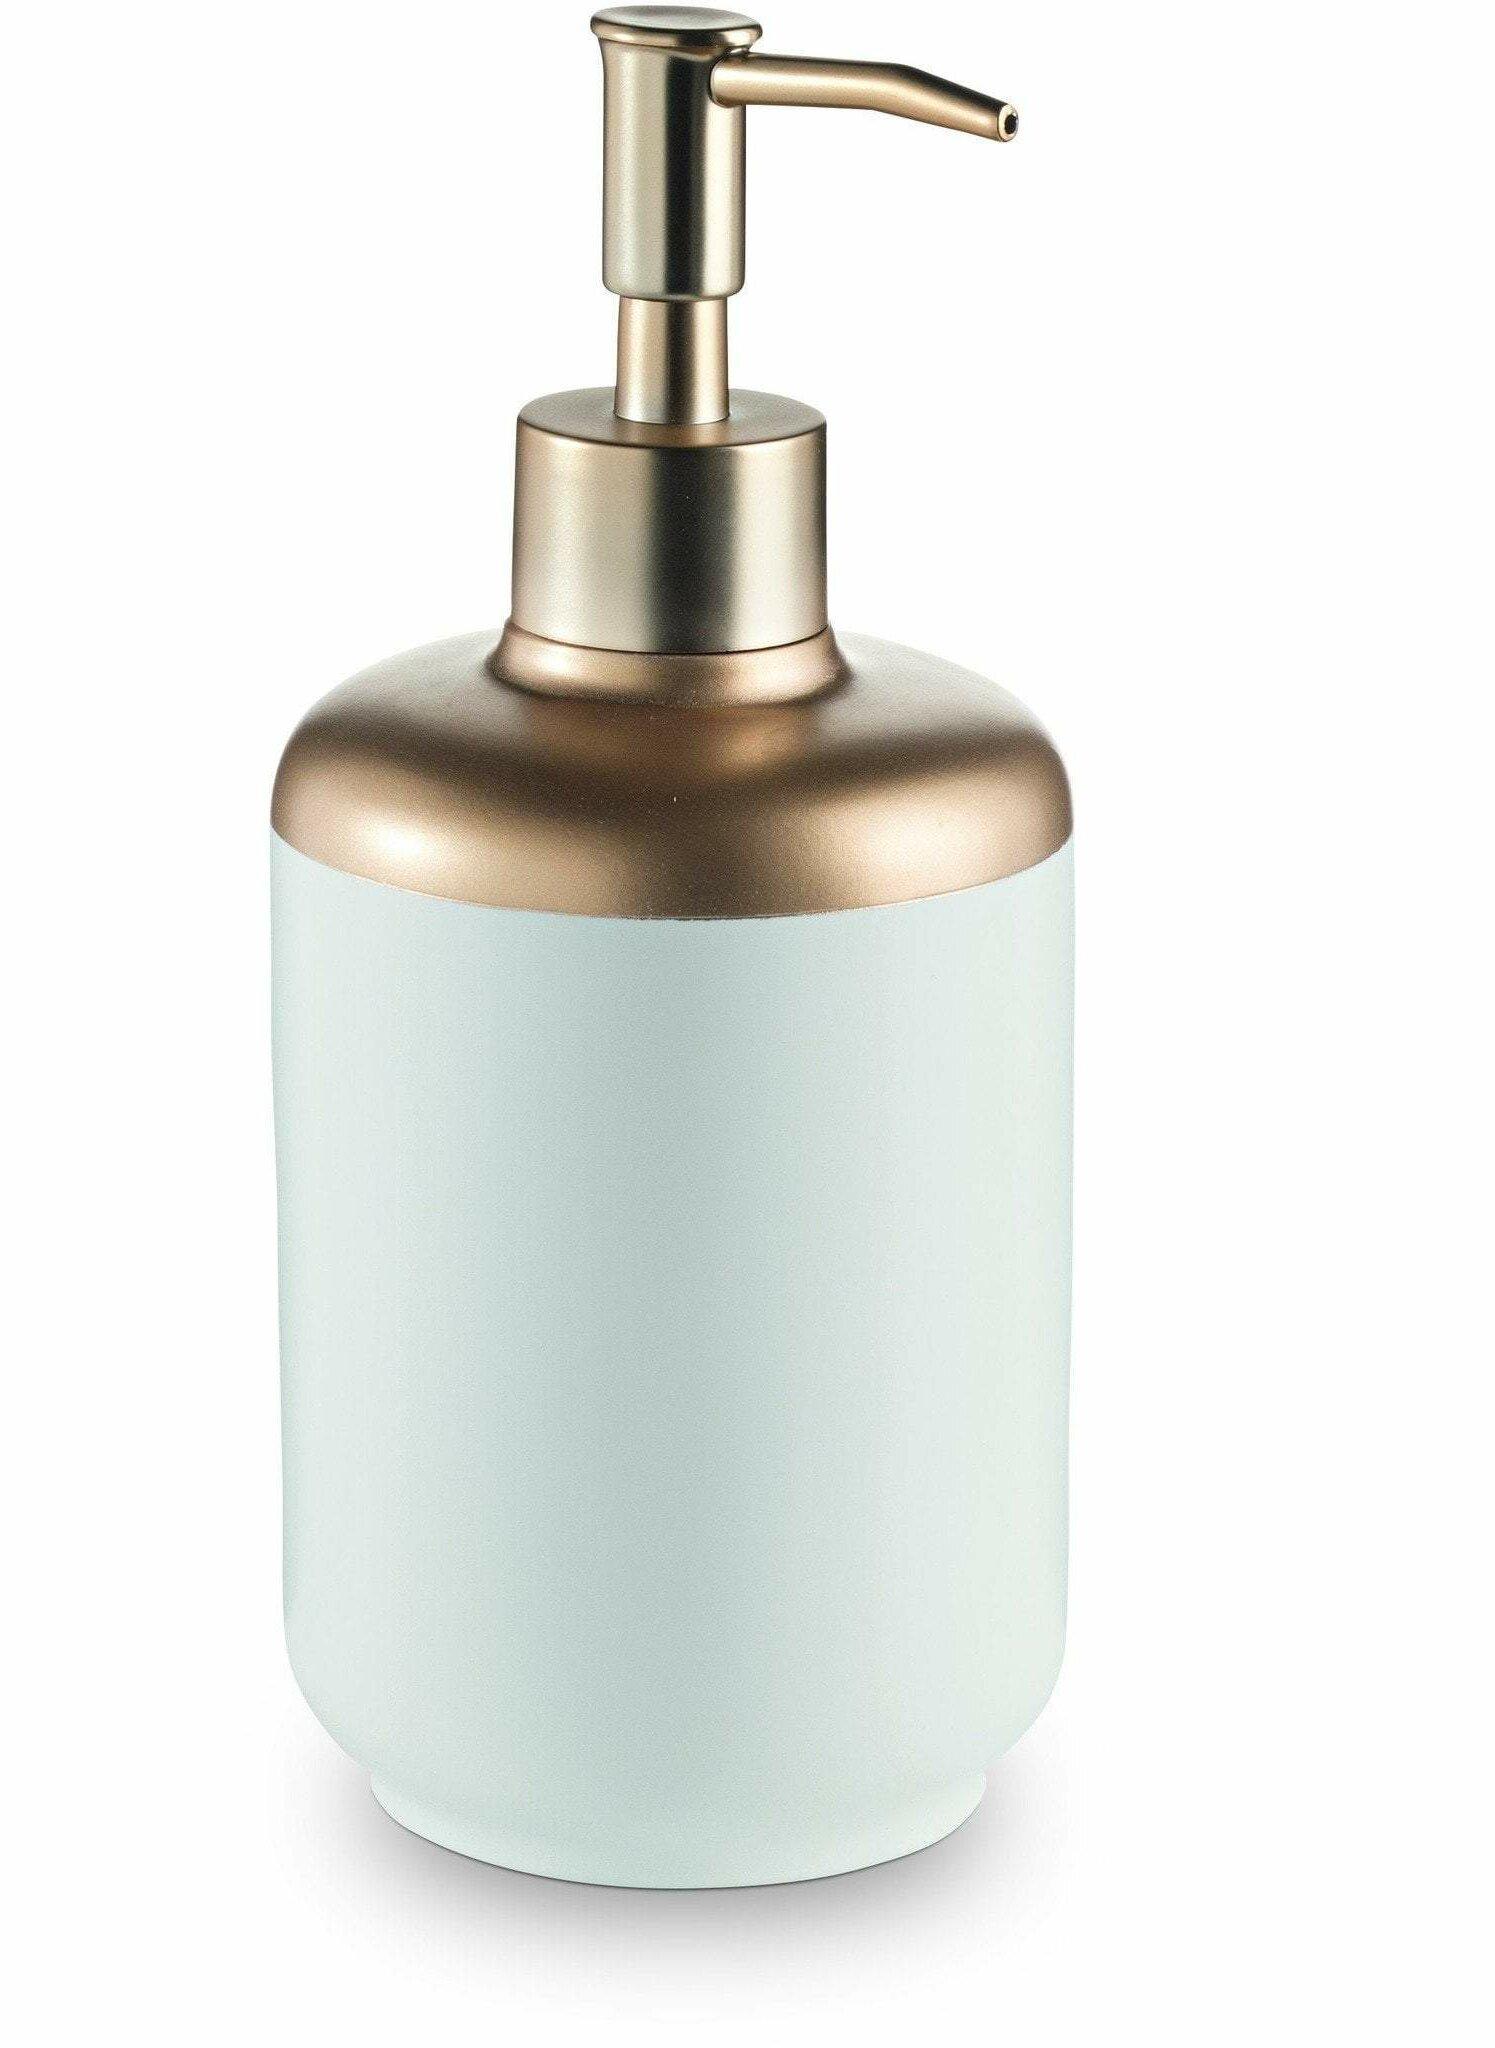 Basics Teardrop Hand Soap Pump Dispenser